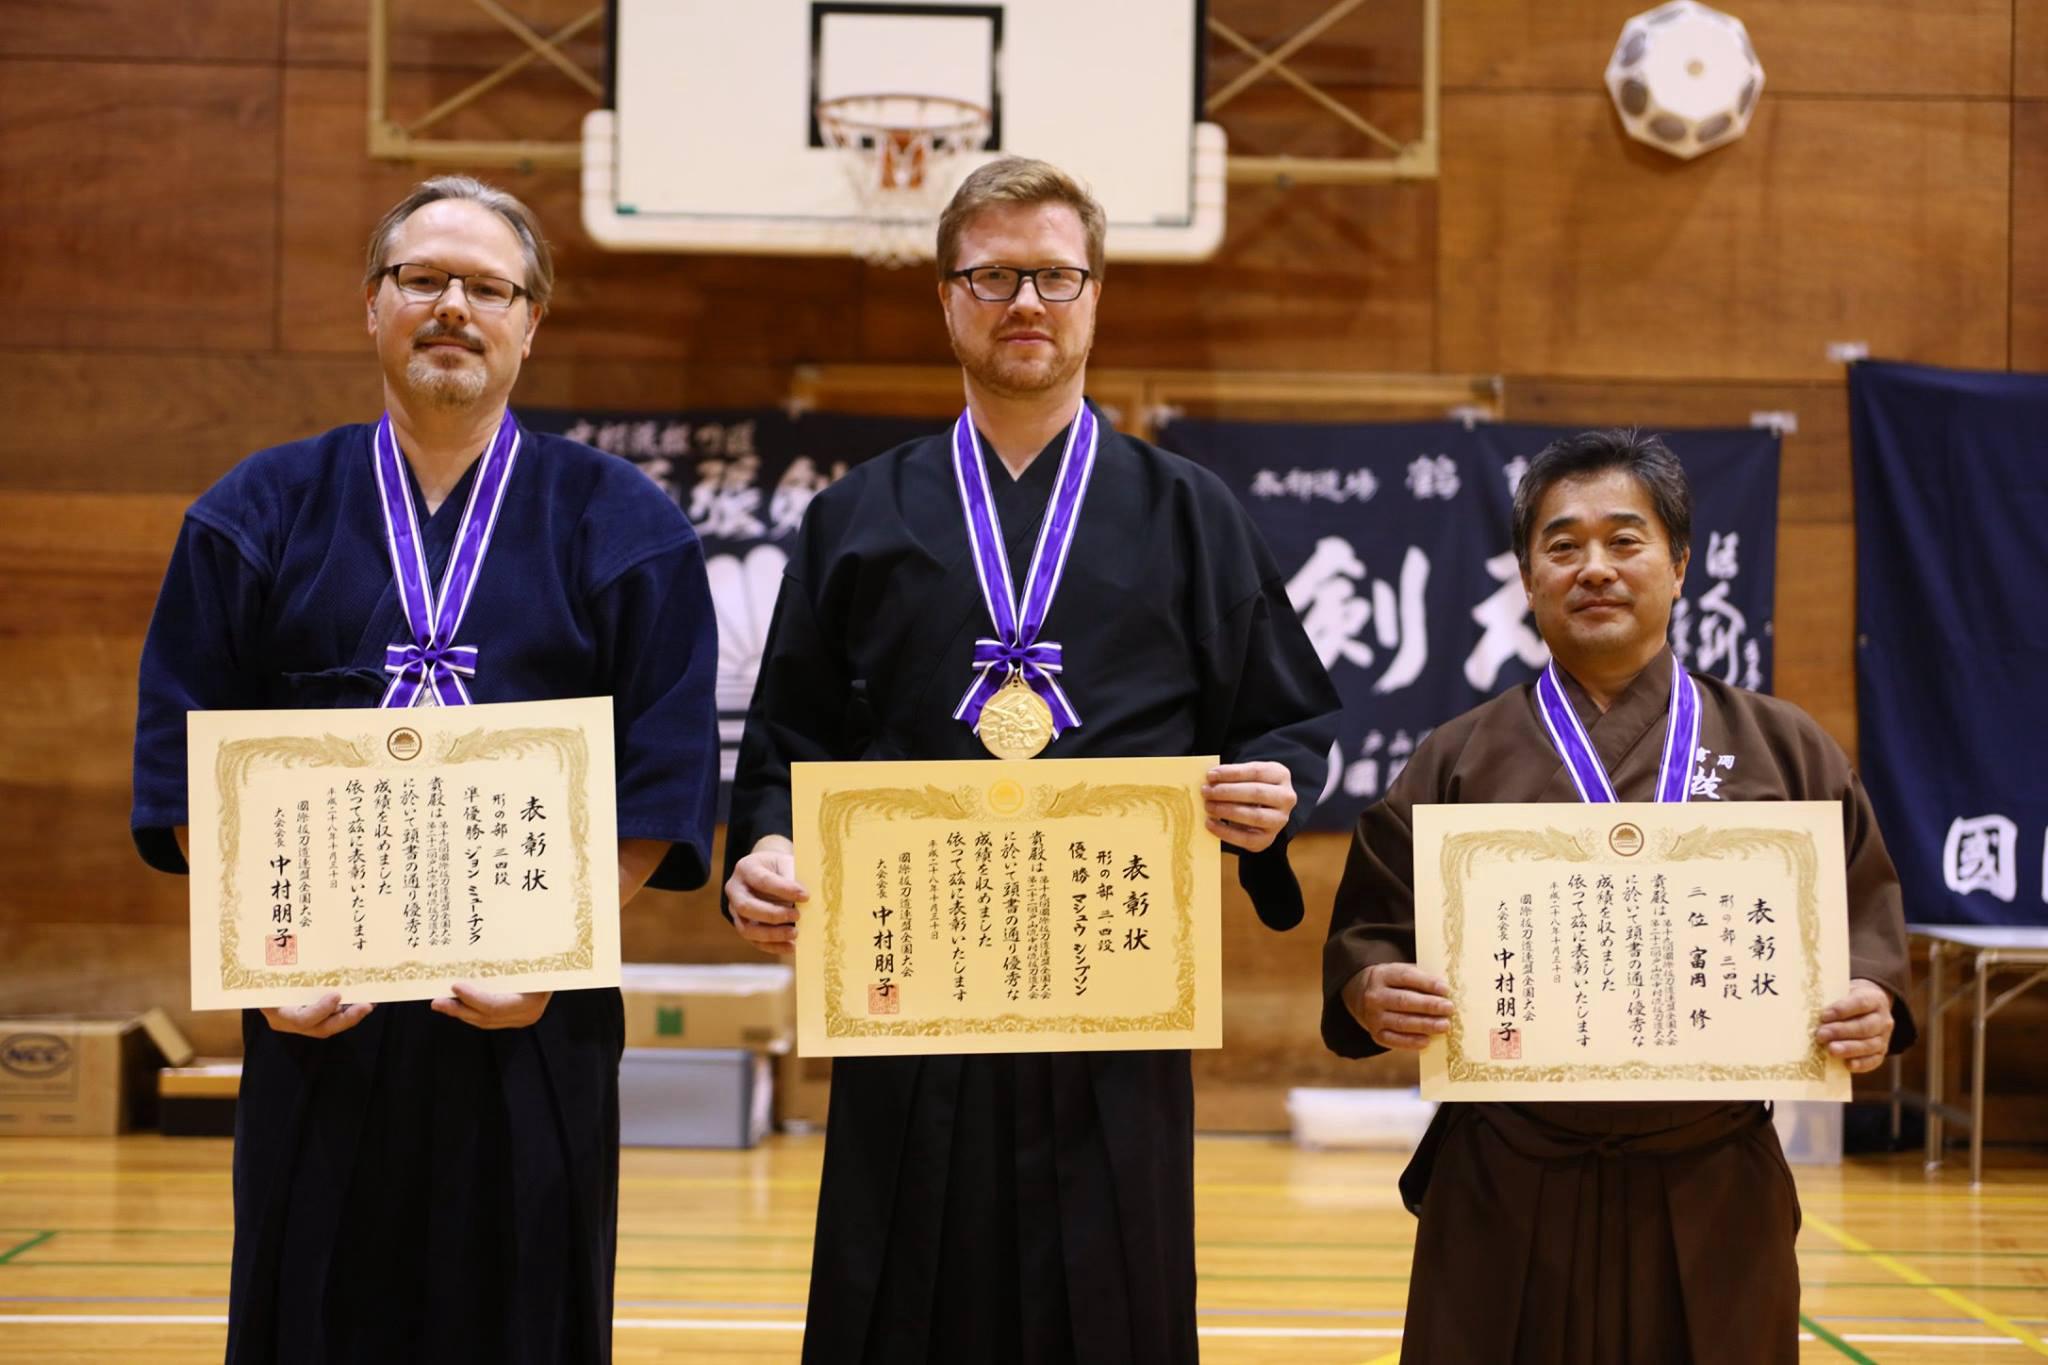 Tex - 2nd place kata - Sandan/Yondan division.